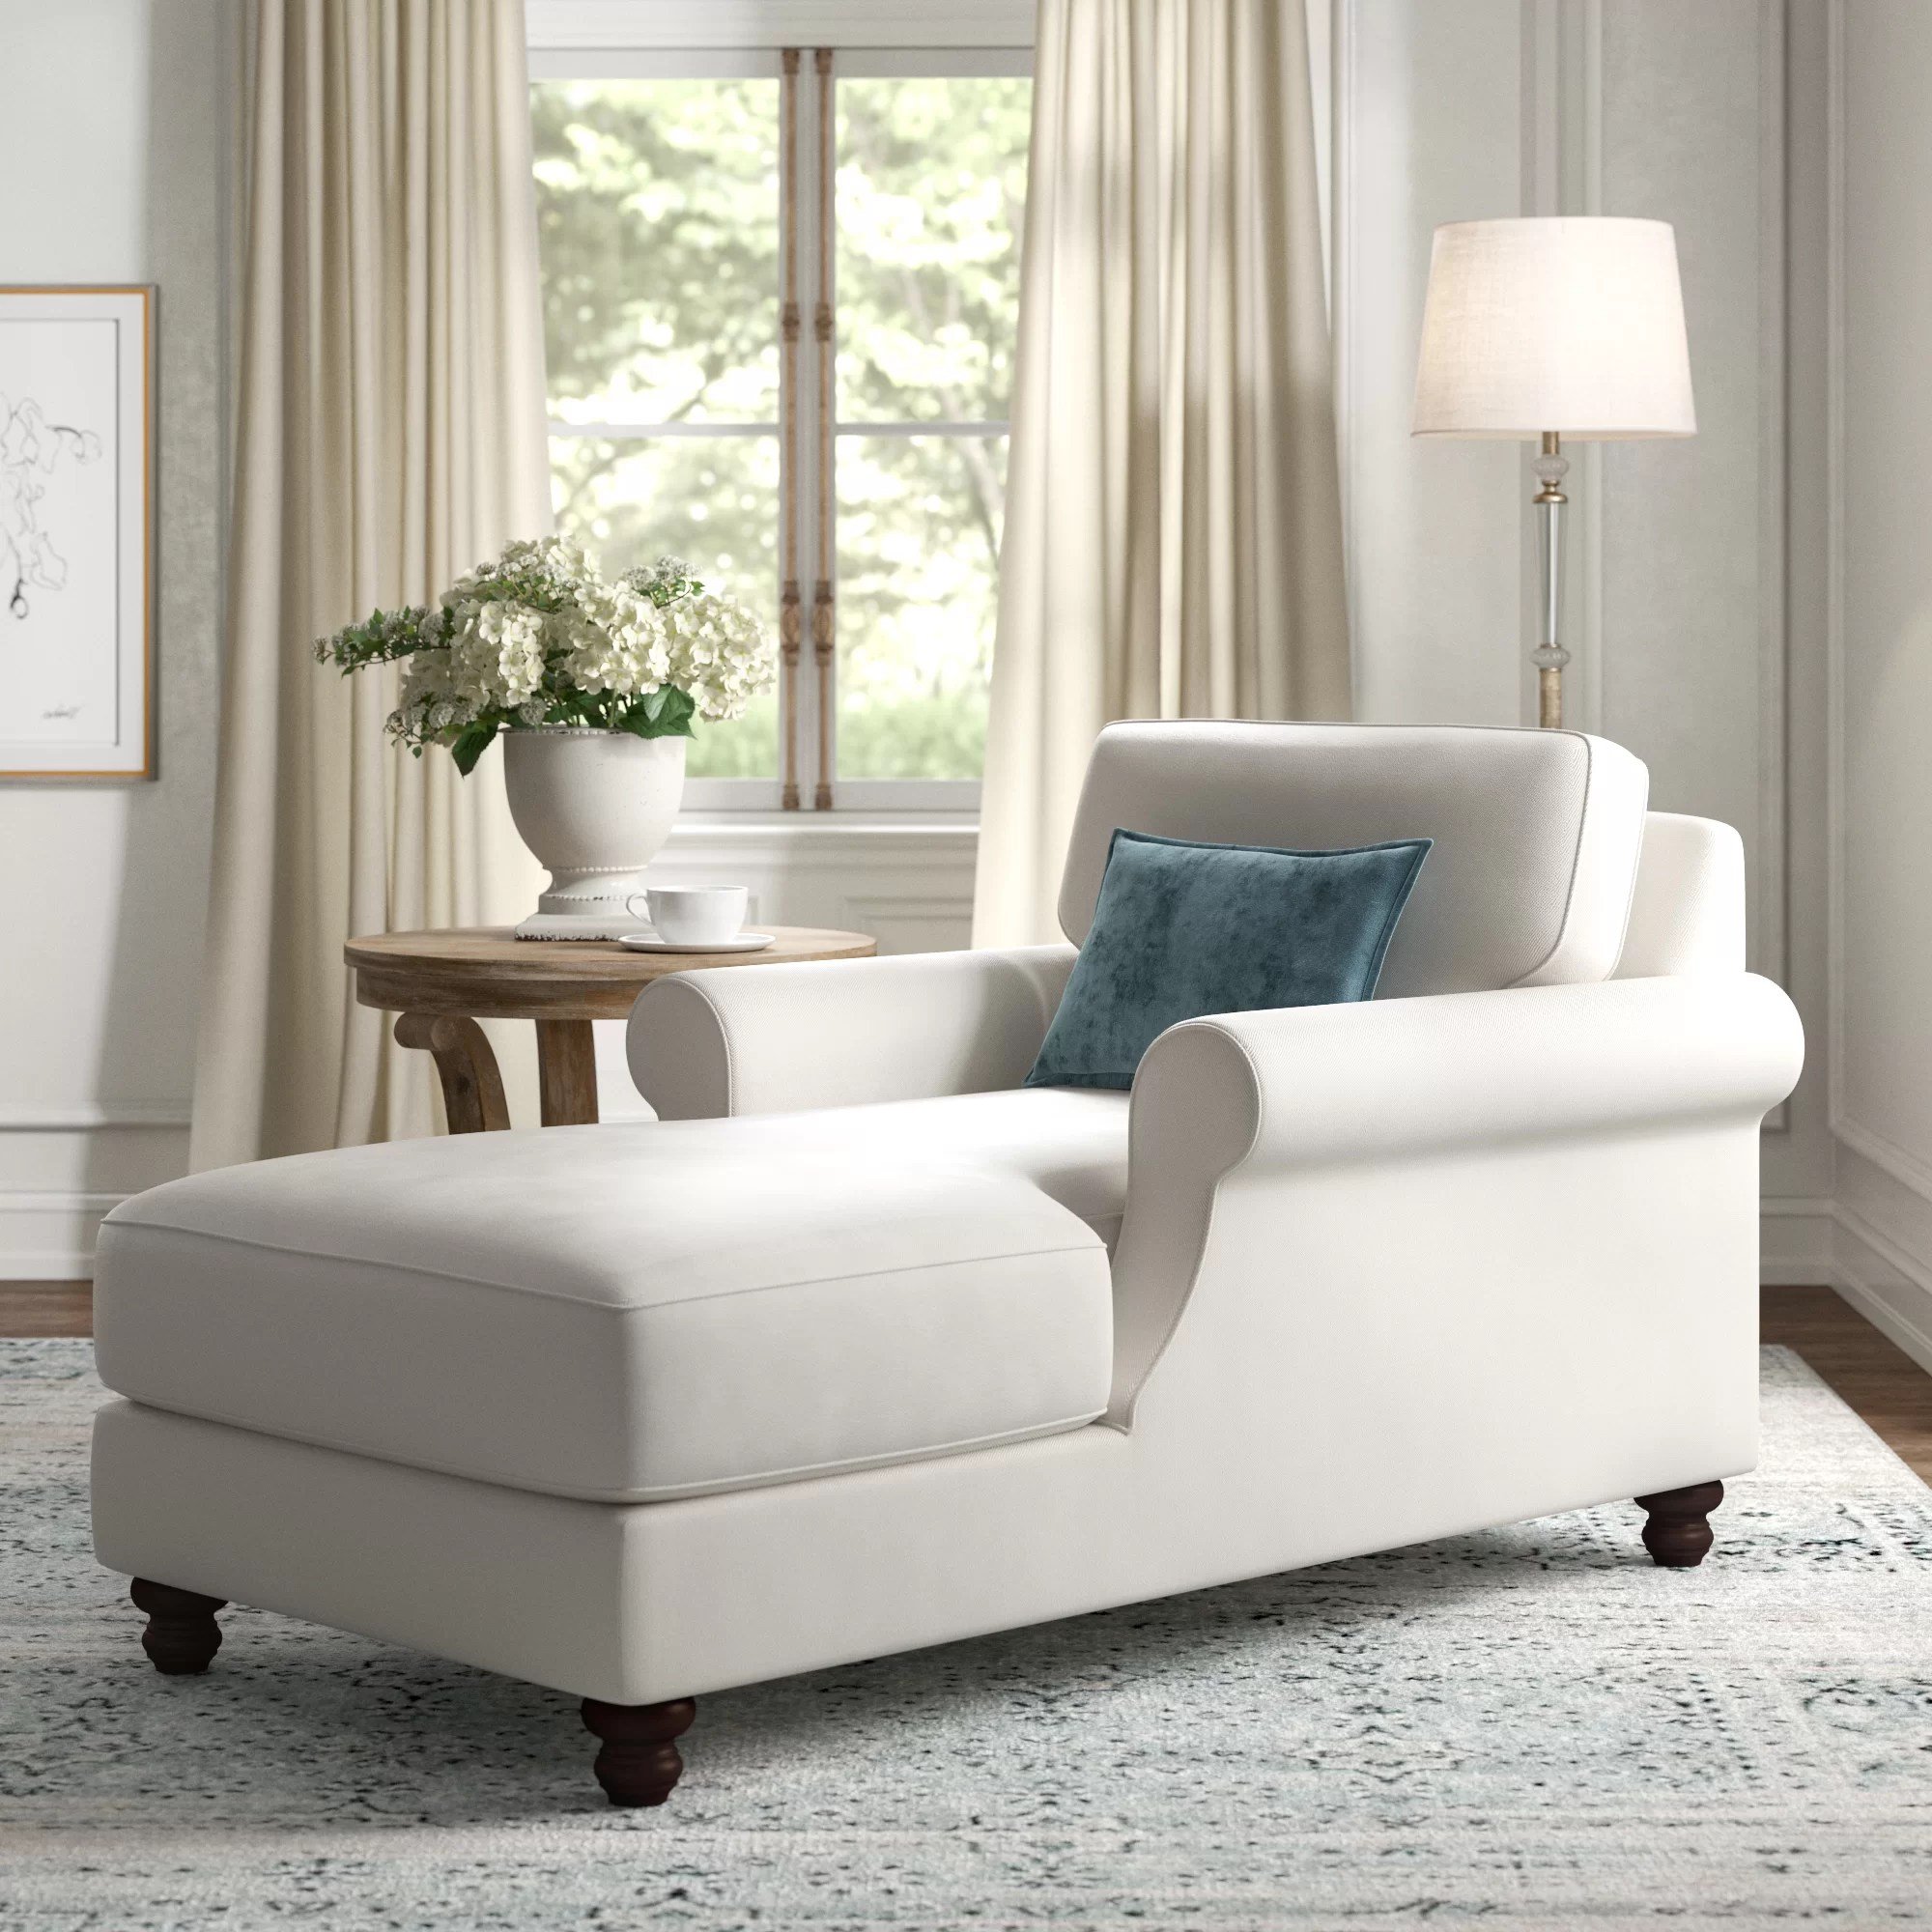 wayfair white chaise lounge chairs